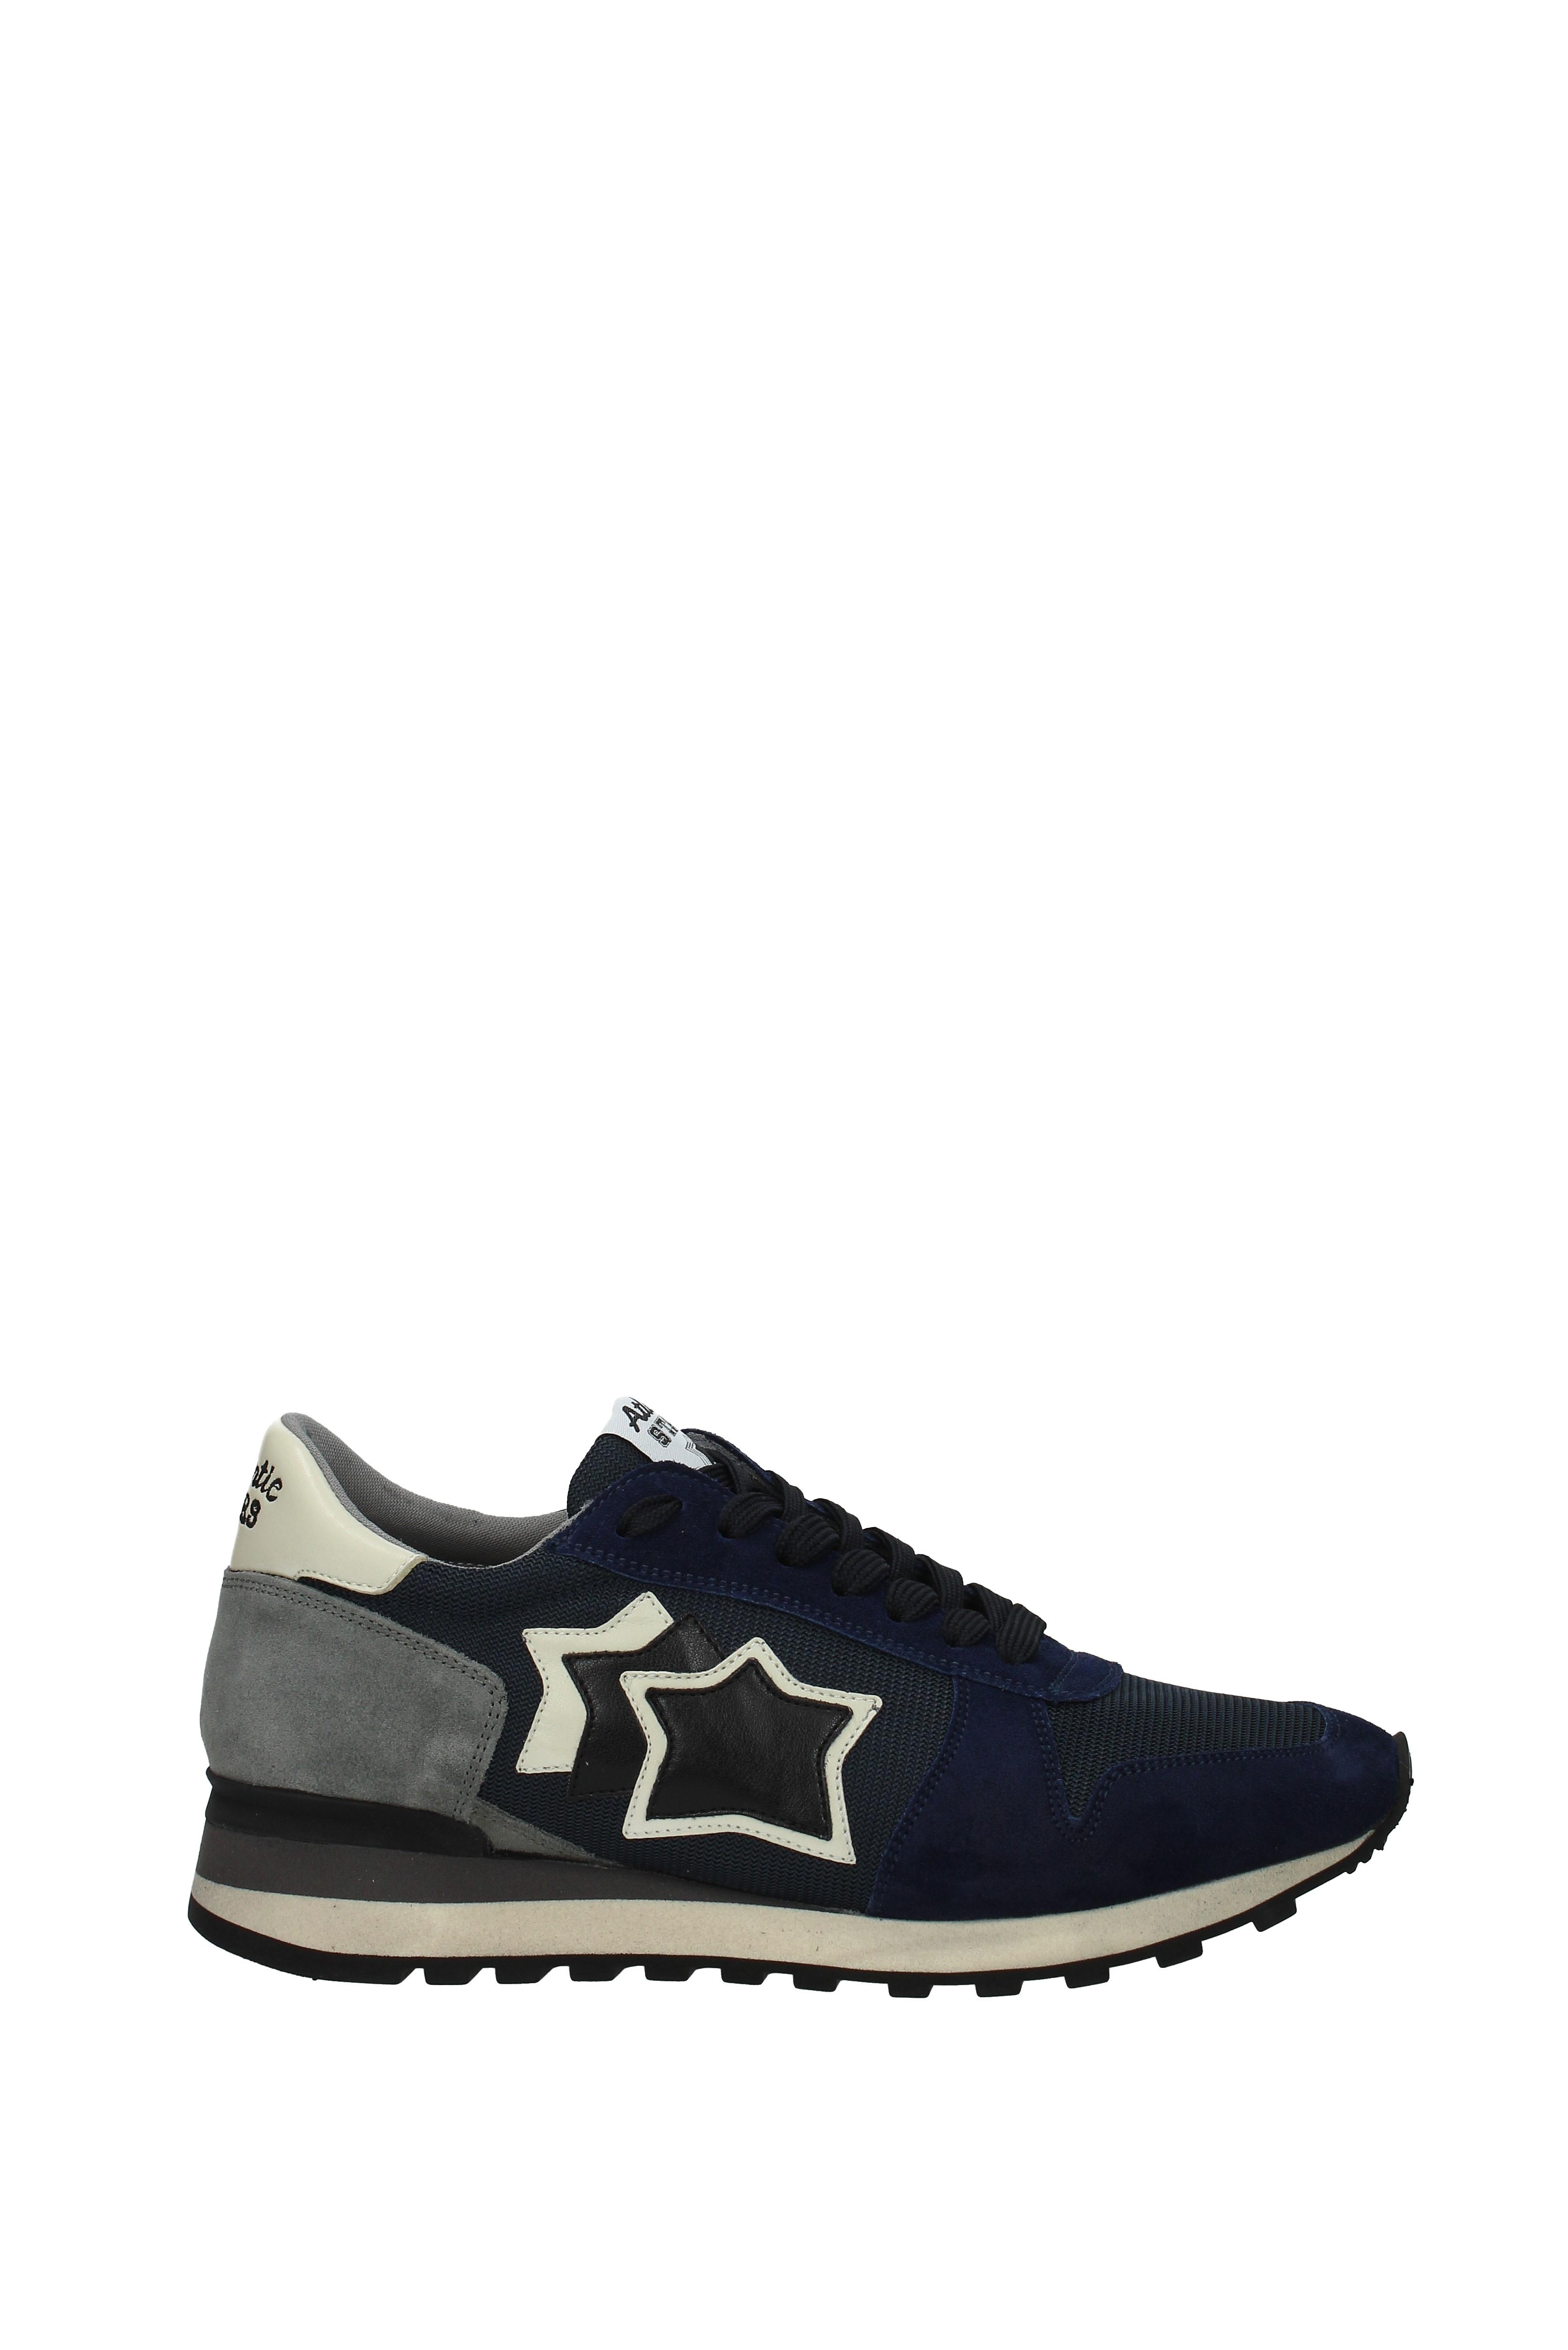 Sneakers Atlantic Herren Stars argo Herren Atlantic - Wildleder (TESSUTOLINEEARGO) 32f3da